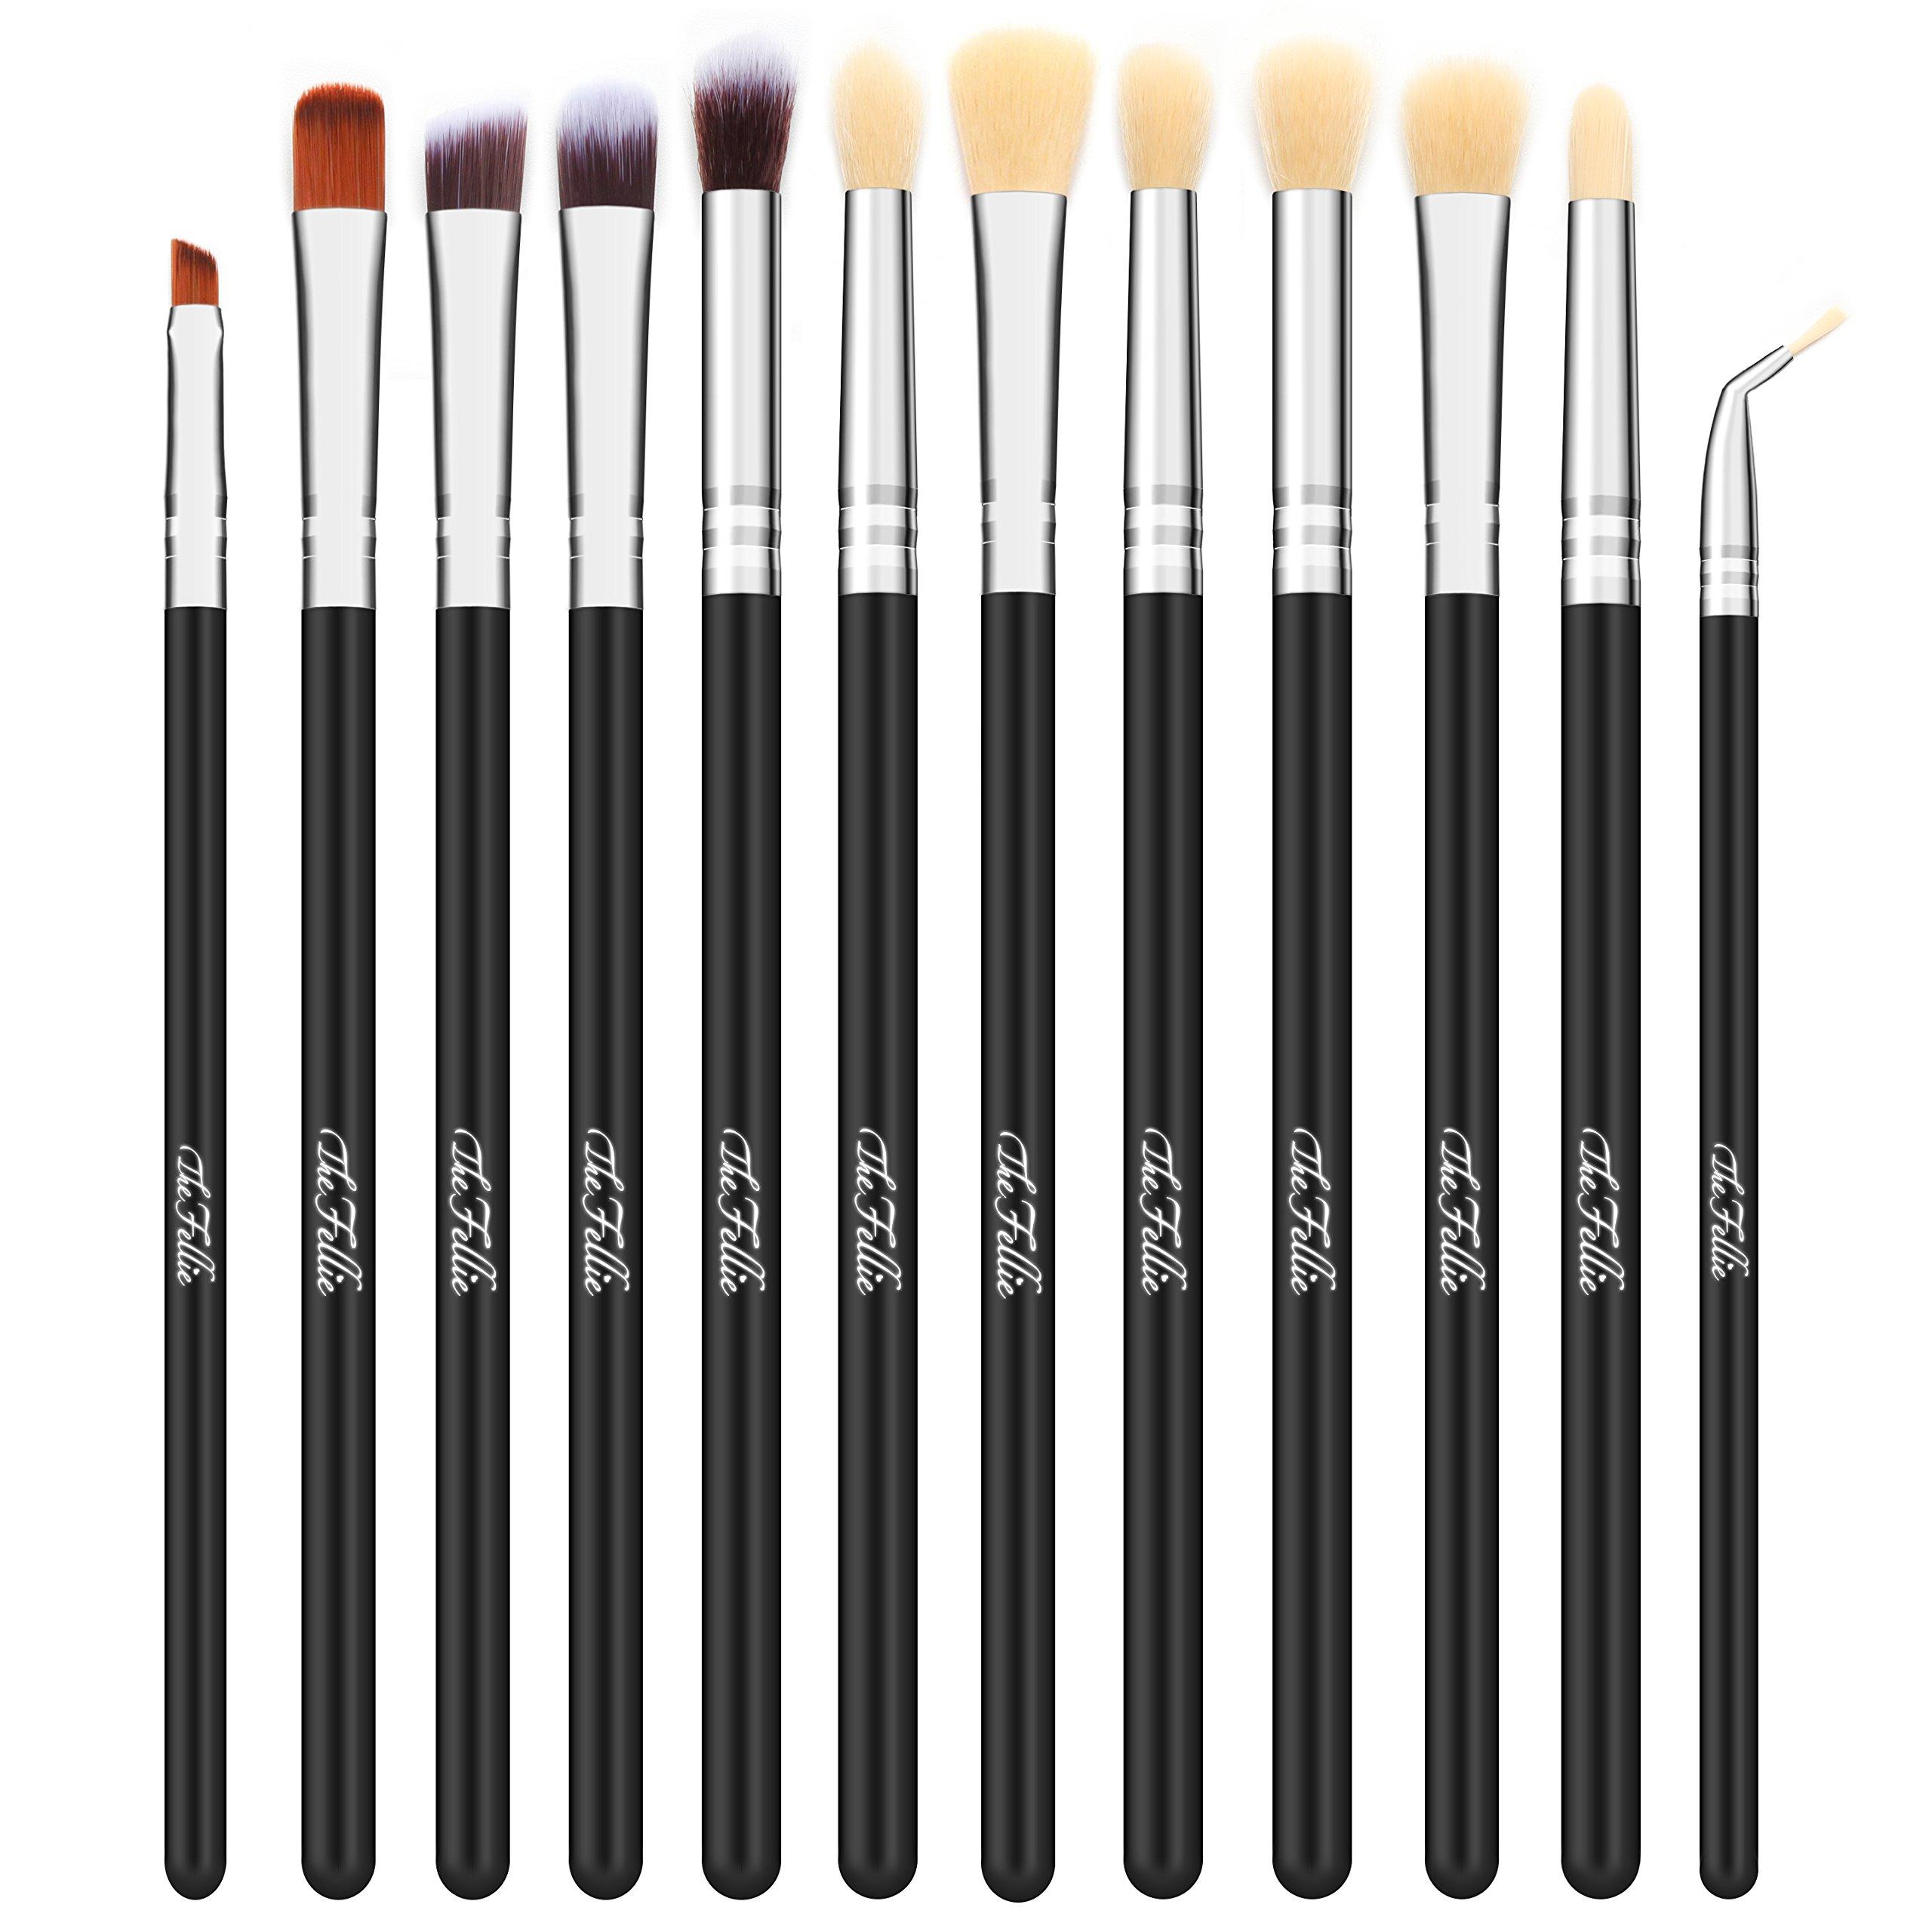 TheFellie Eye Makeup Brushes, Eyeshadow Blending Makeup Brush Set  Professional Concealer Eyeliner Eyebrow Cosmetic Brushes